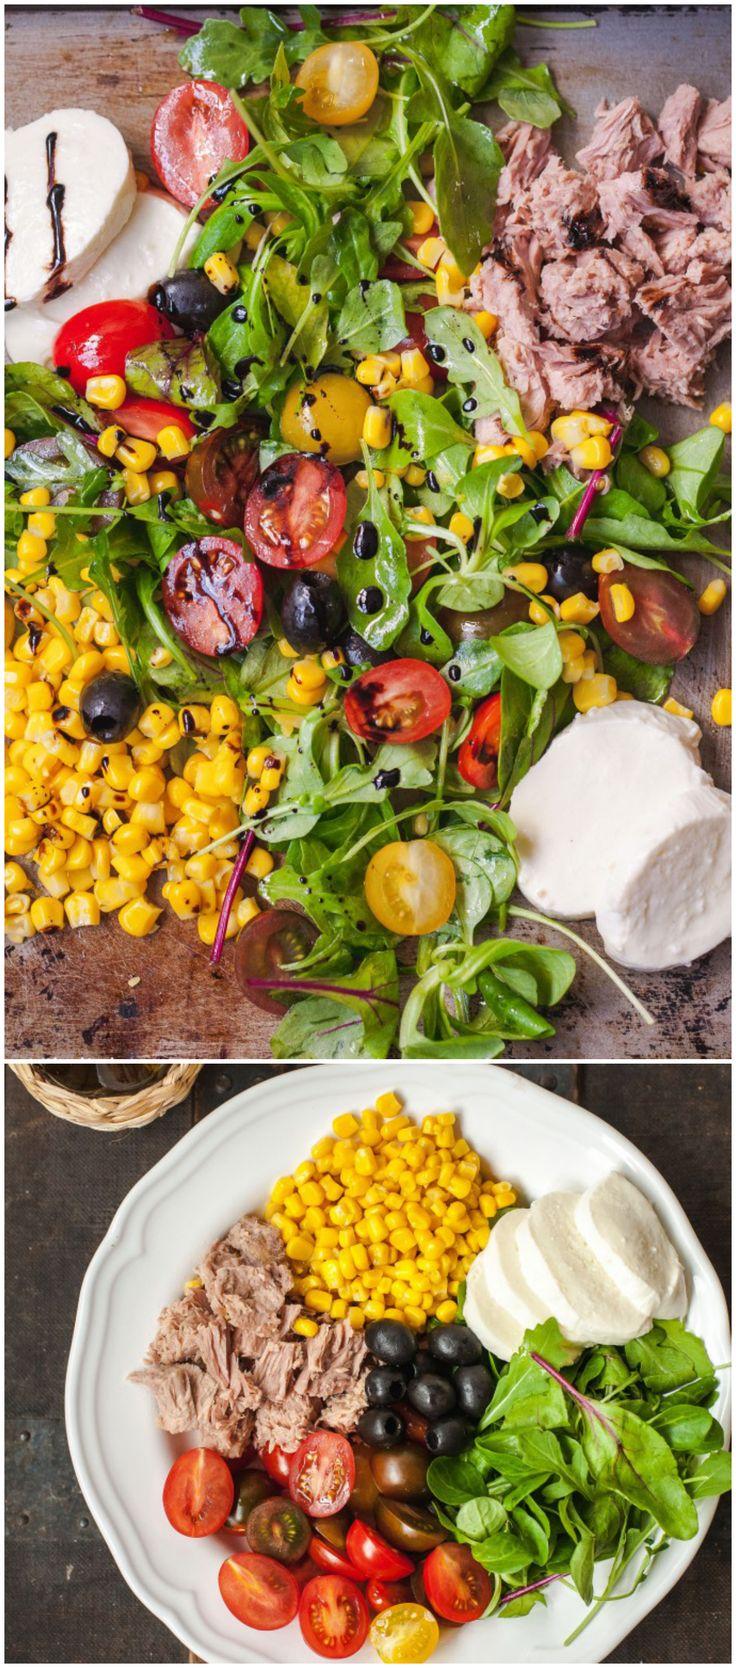 Italian Tuna and Corn Salad with Balsamic reduction.